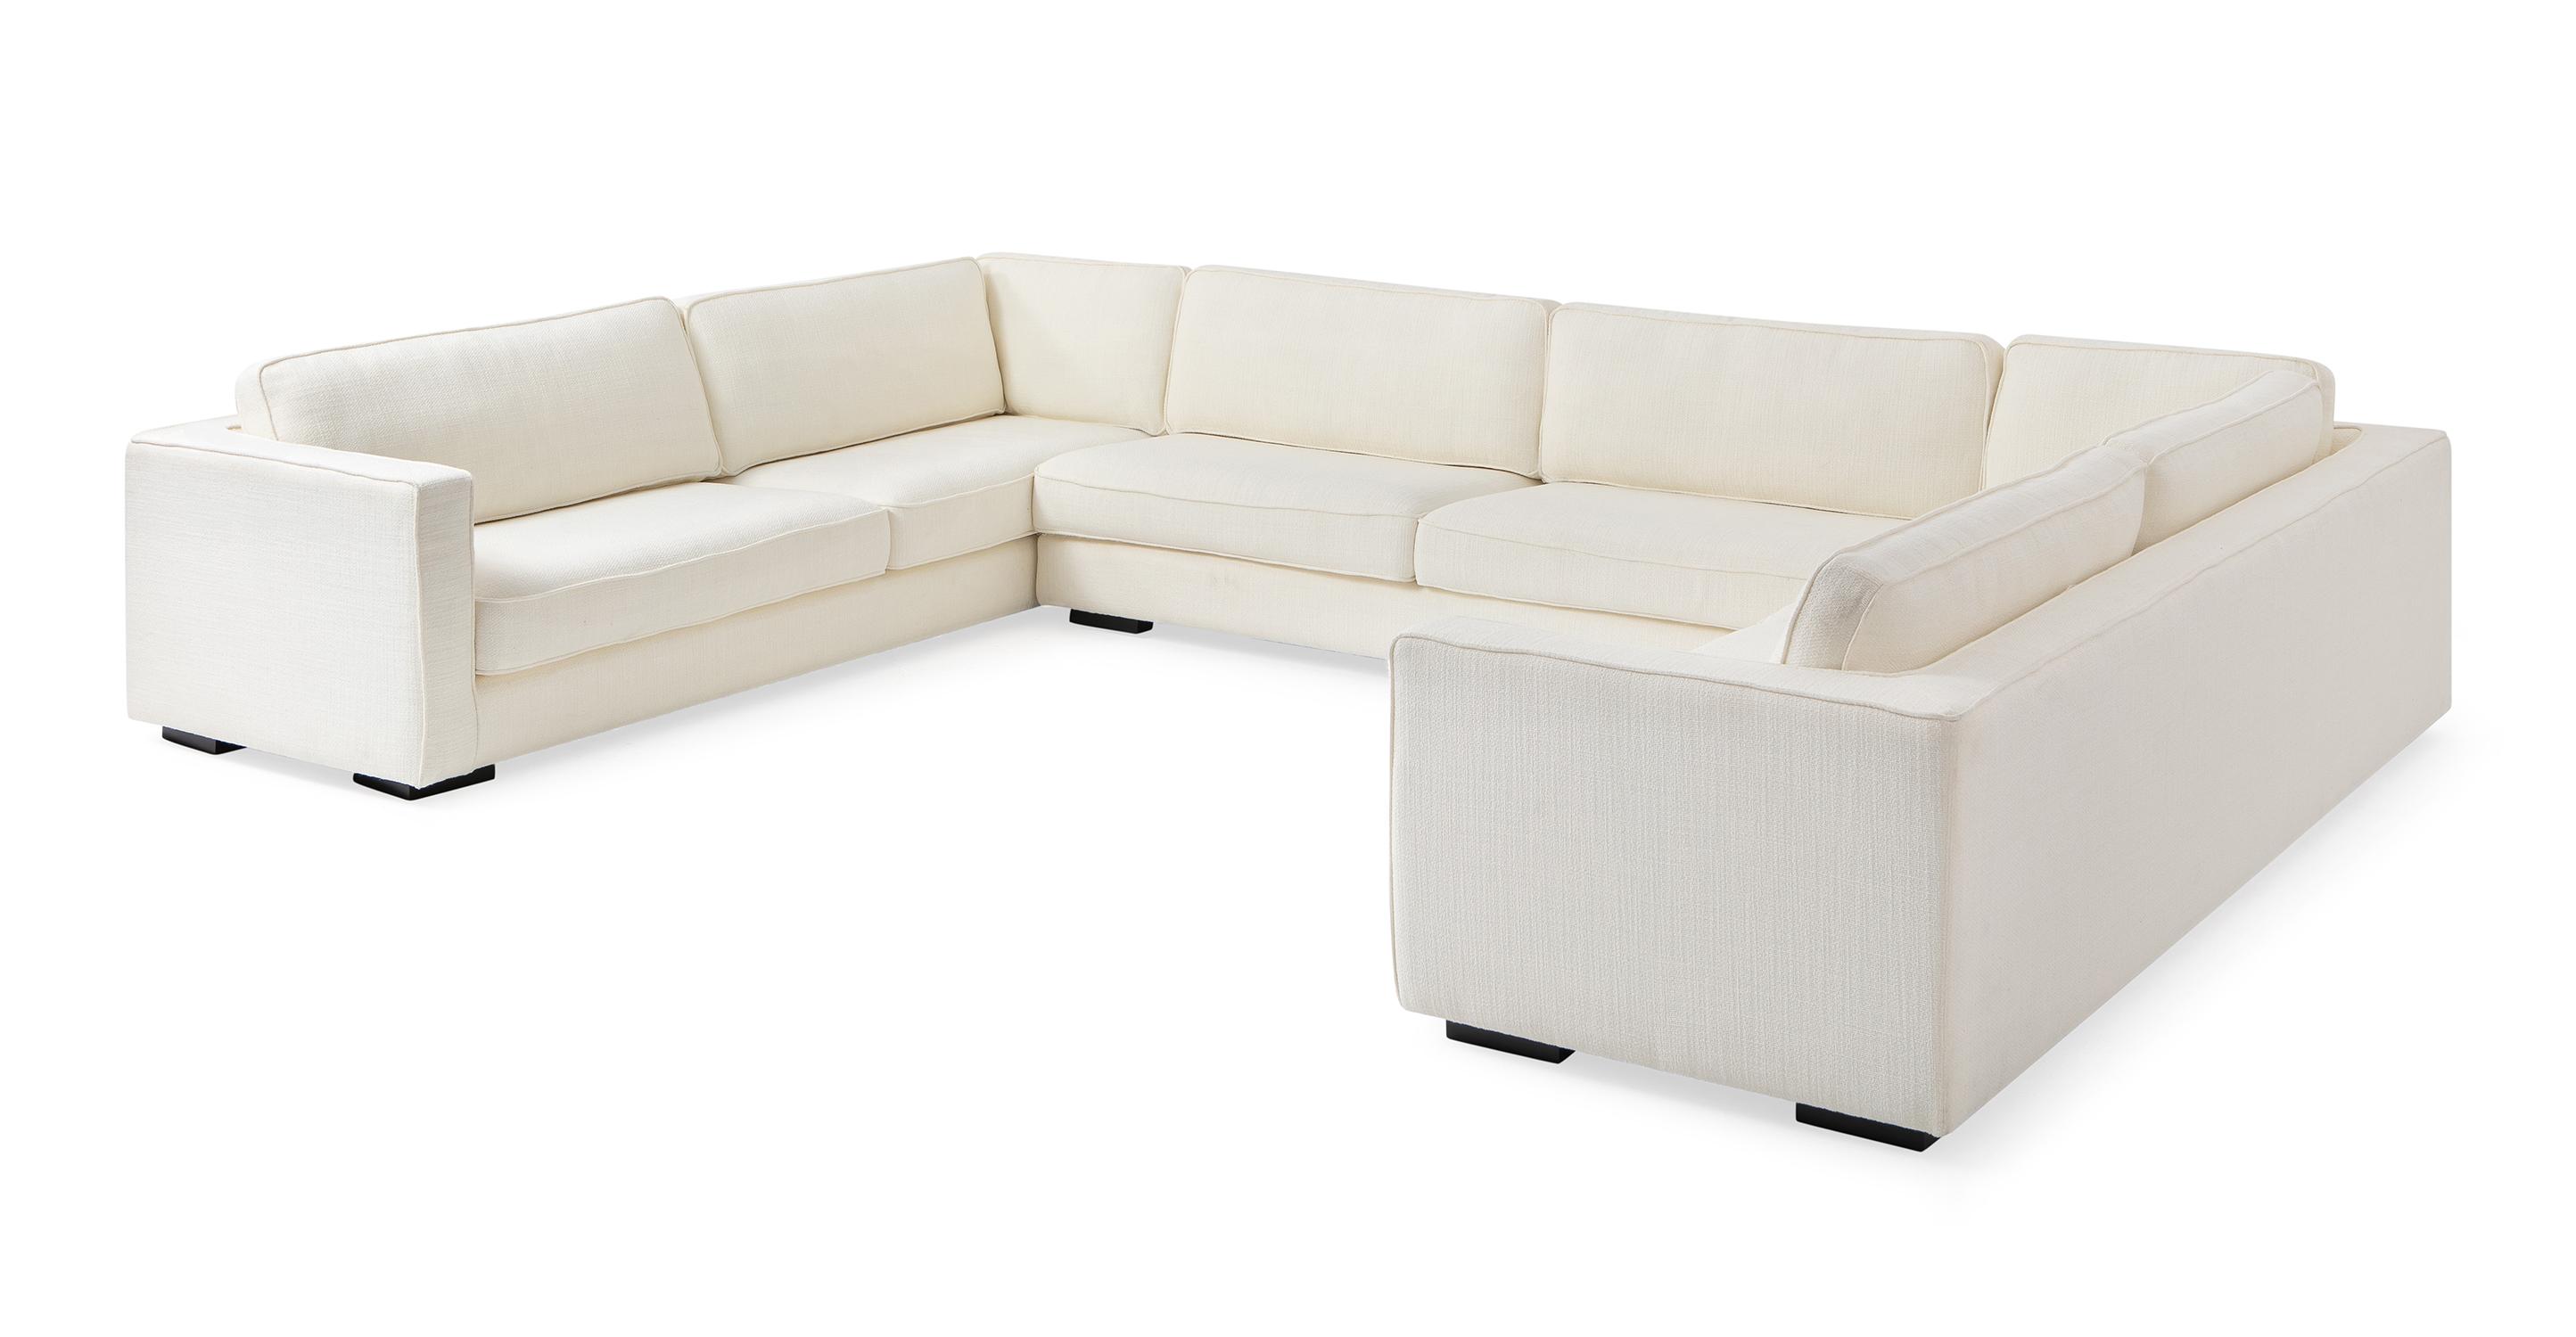 "Architect 156"" Fabric U-Sofa Sectional, Jour Boucle"